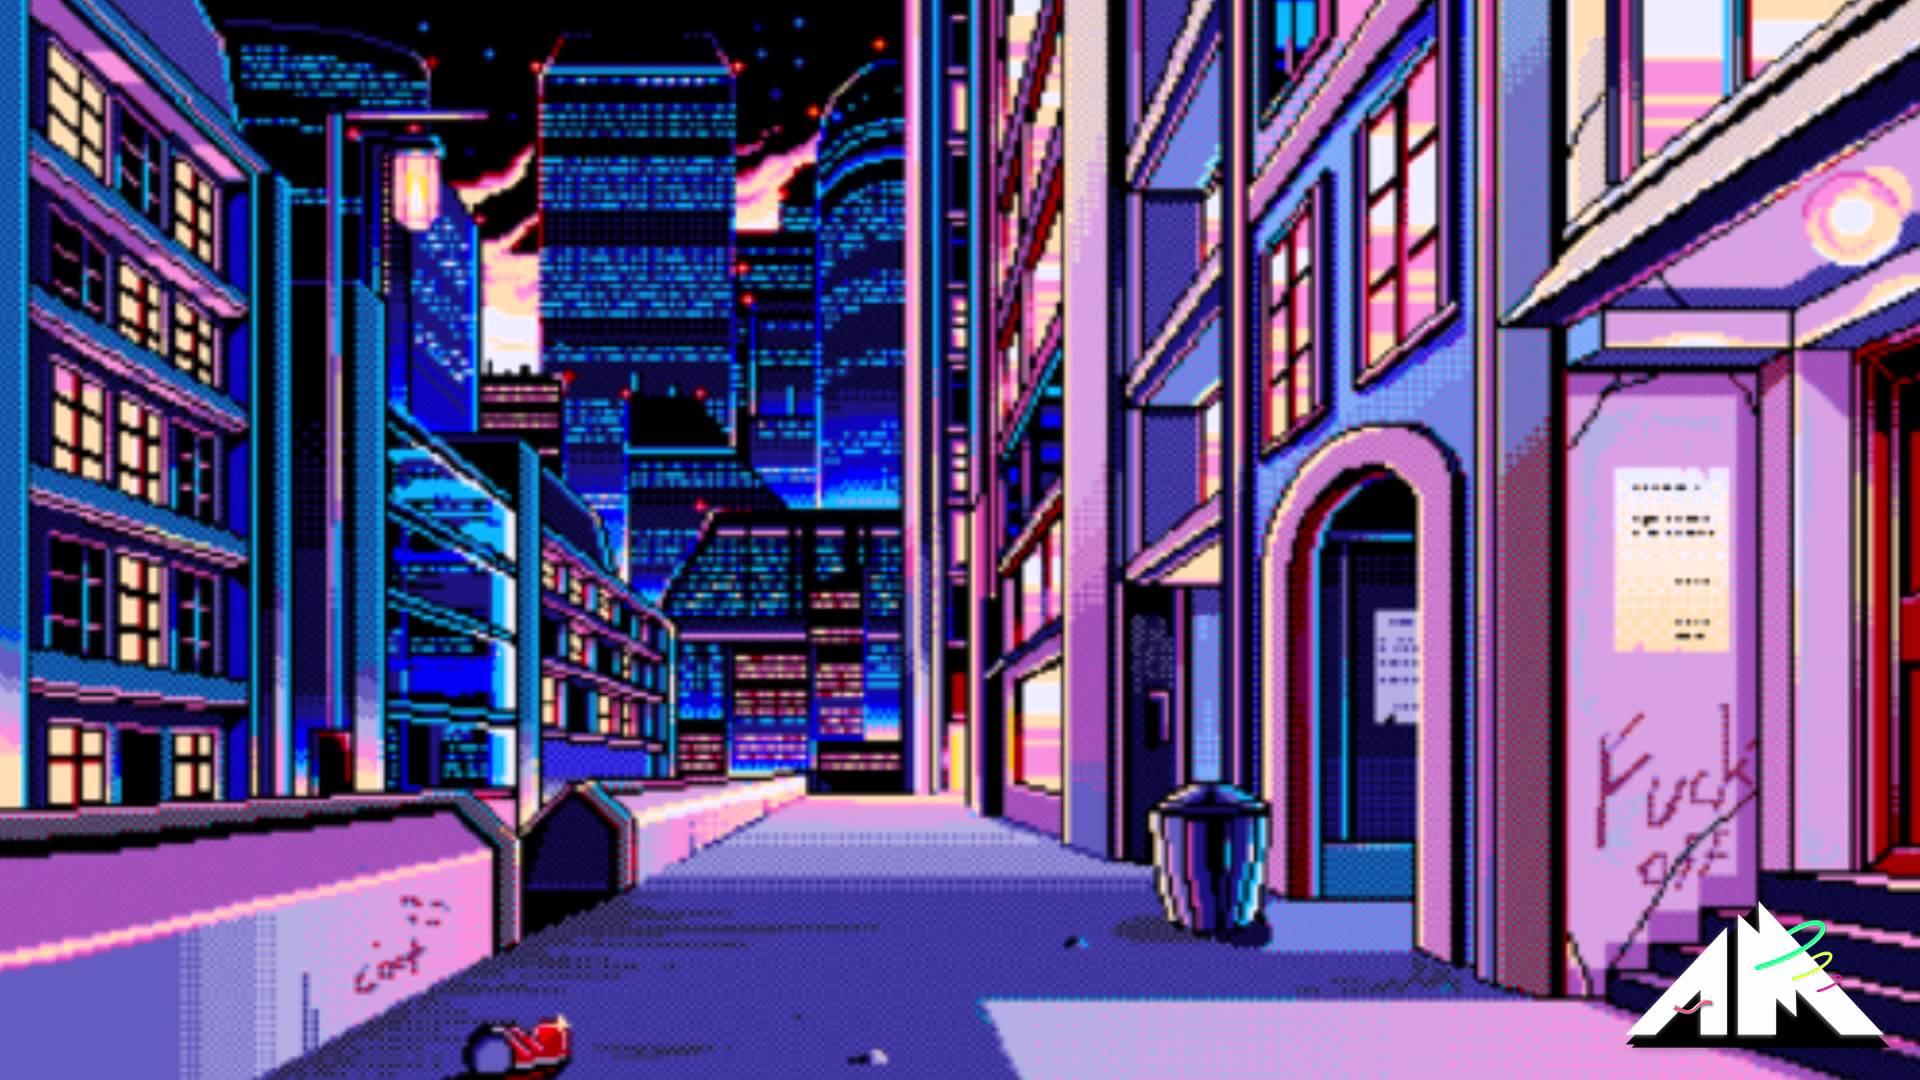 Retro Anime Wallpapers - Top Free Retro Anime Backgrounds ...